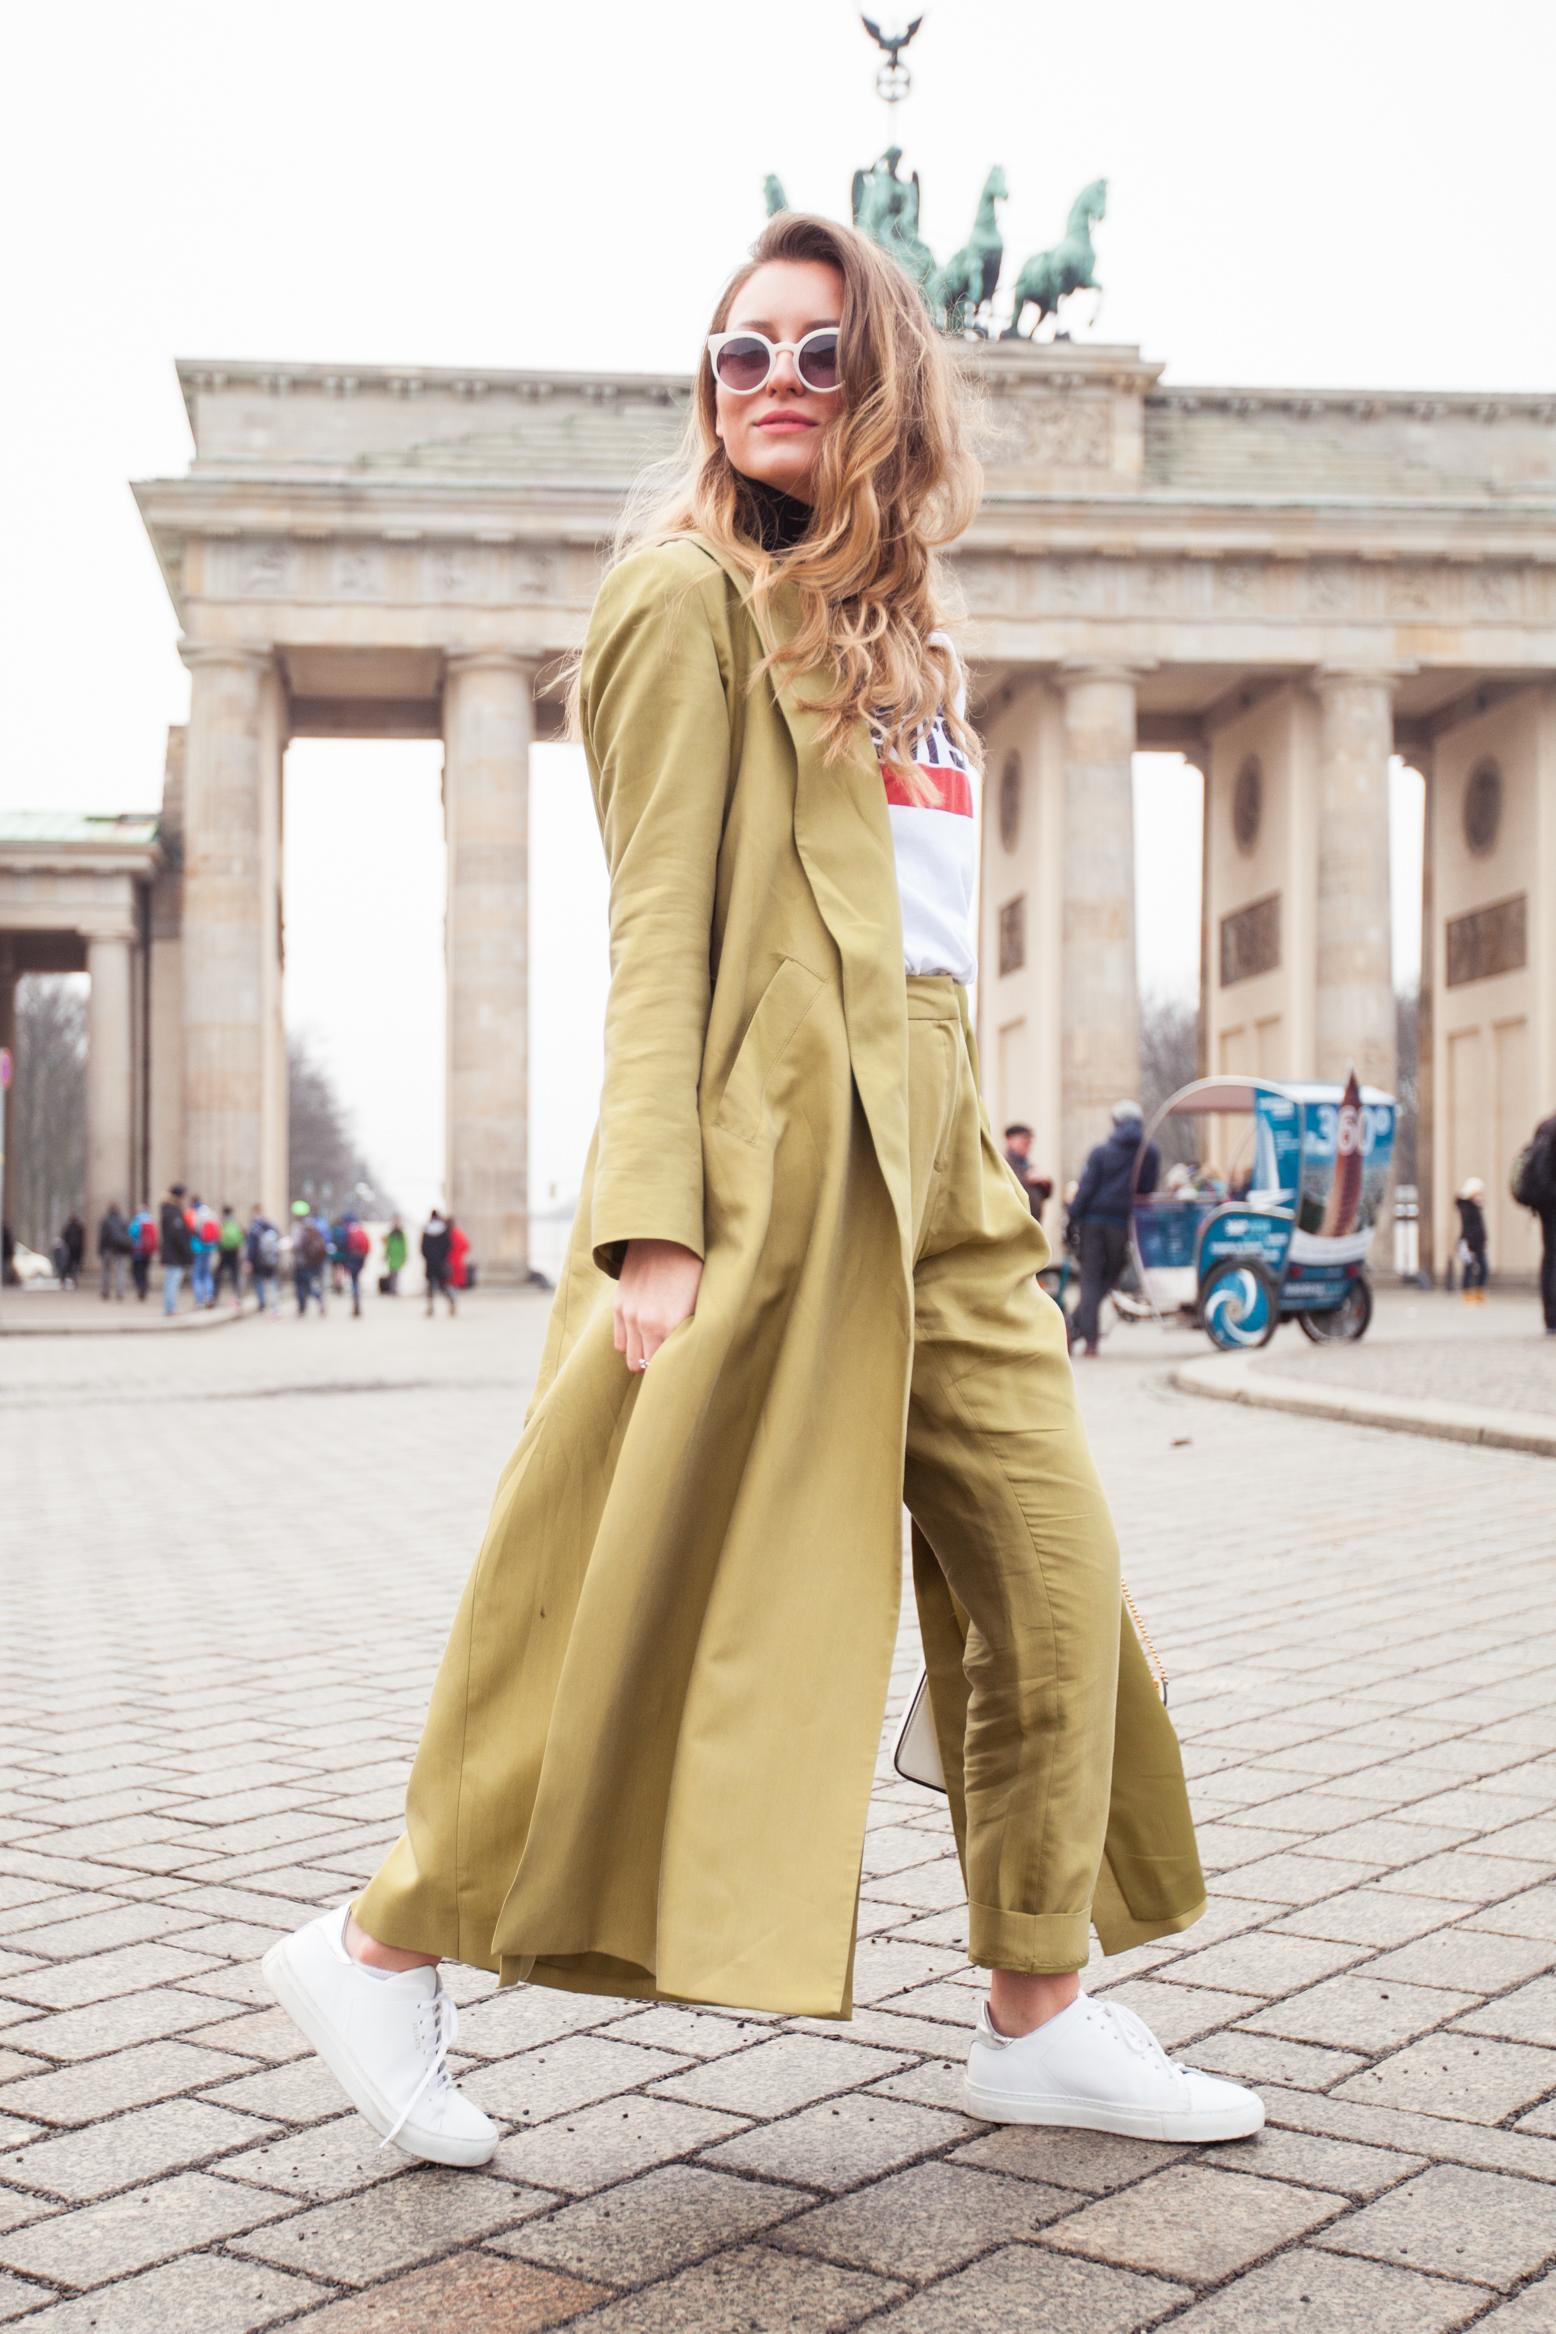 fashionweek-streetstyle-ivy&oak-livia-auer-5934